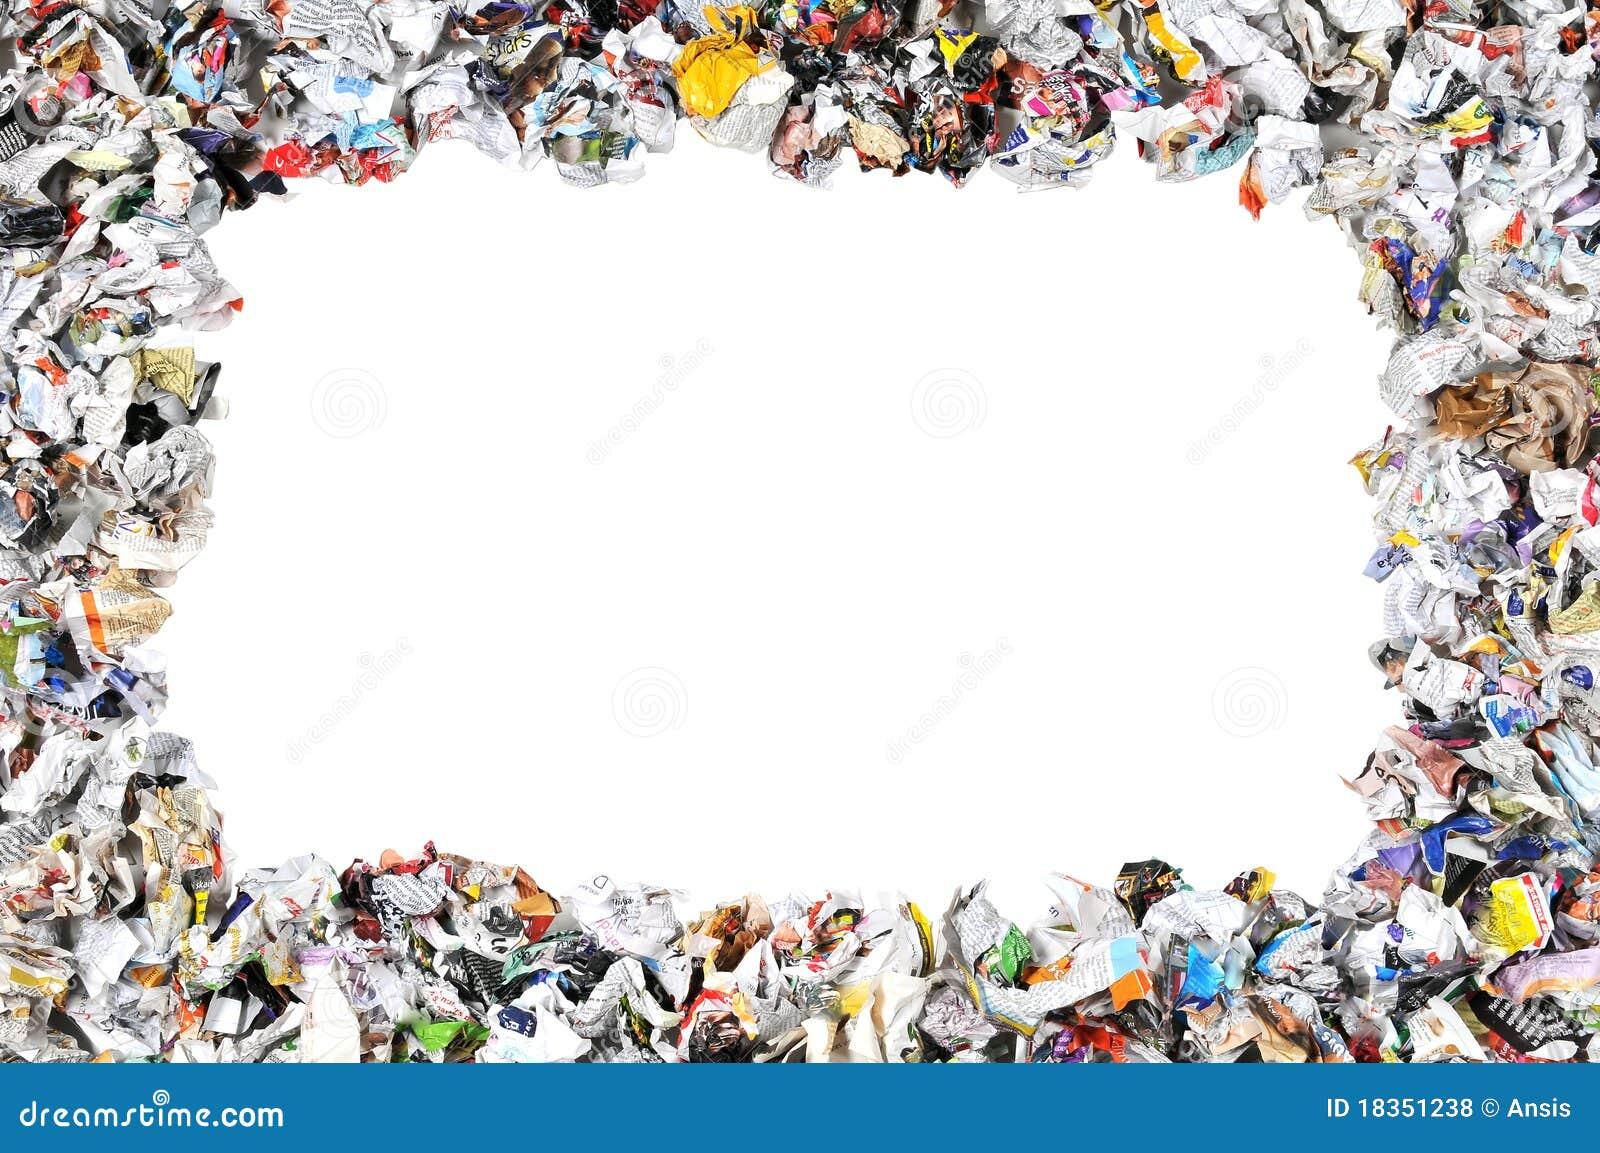 Newspaper Frame 3:2 stock photo. Image of crumple, creativity - 18351238